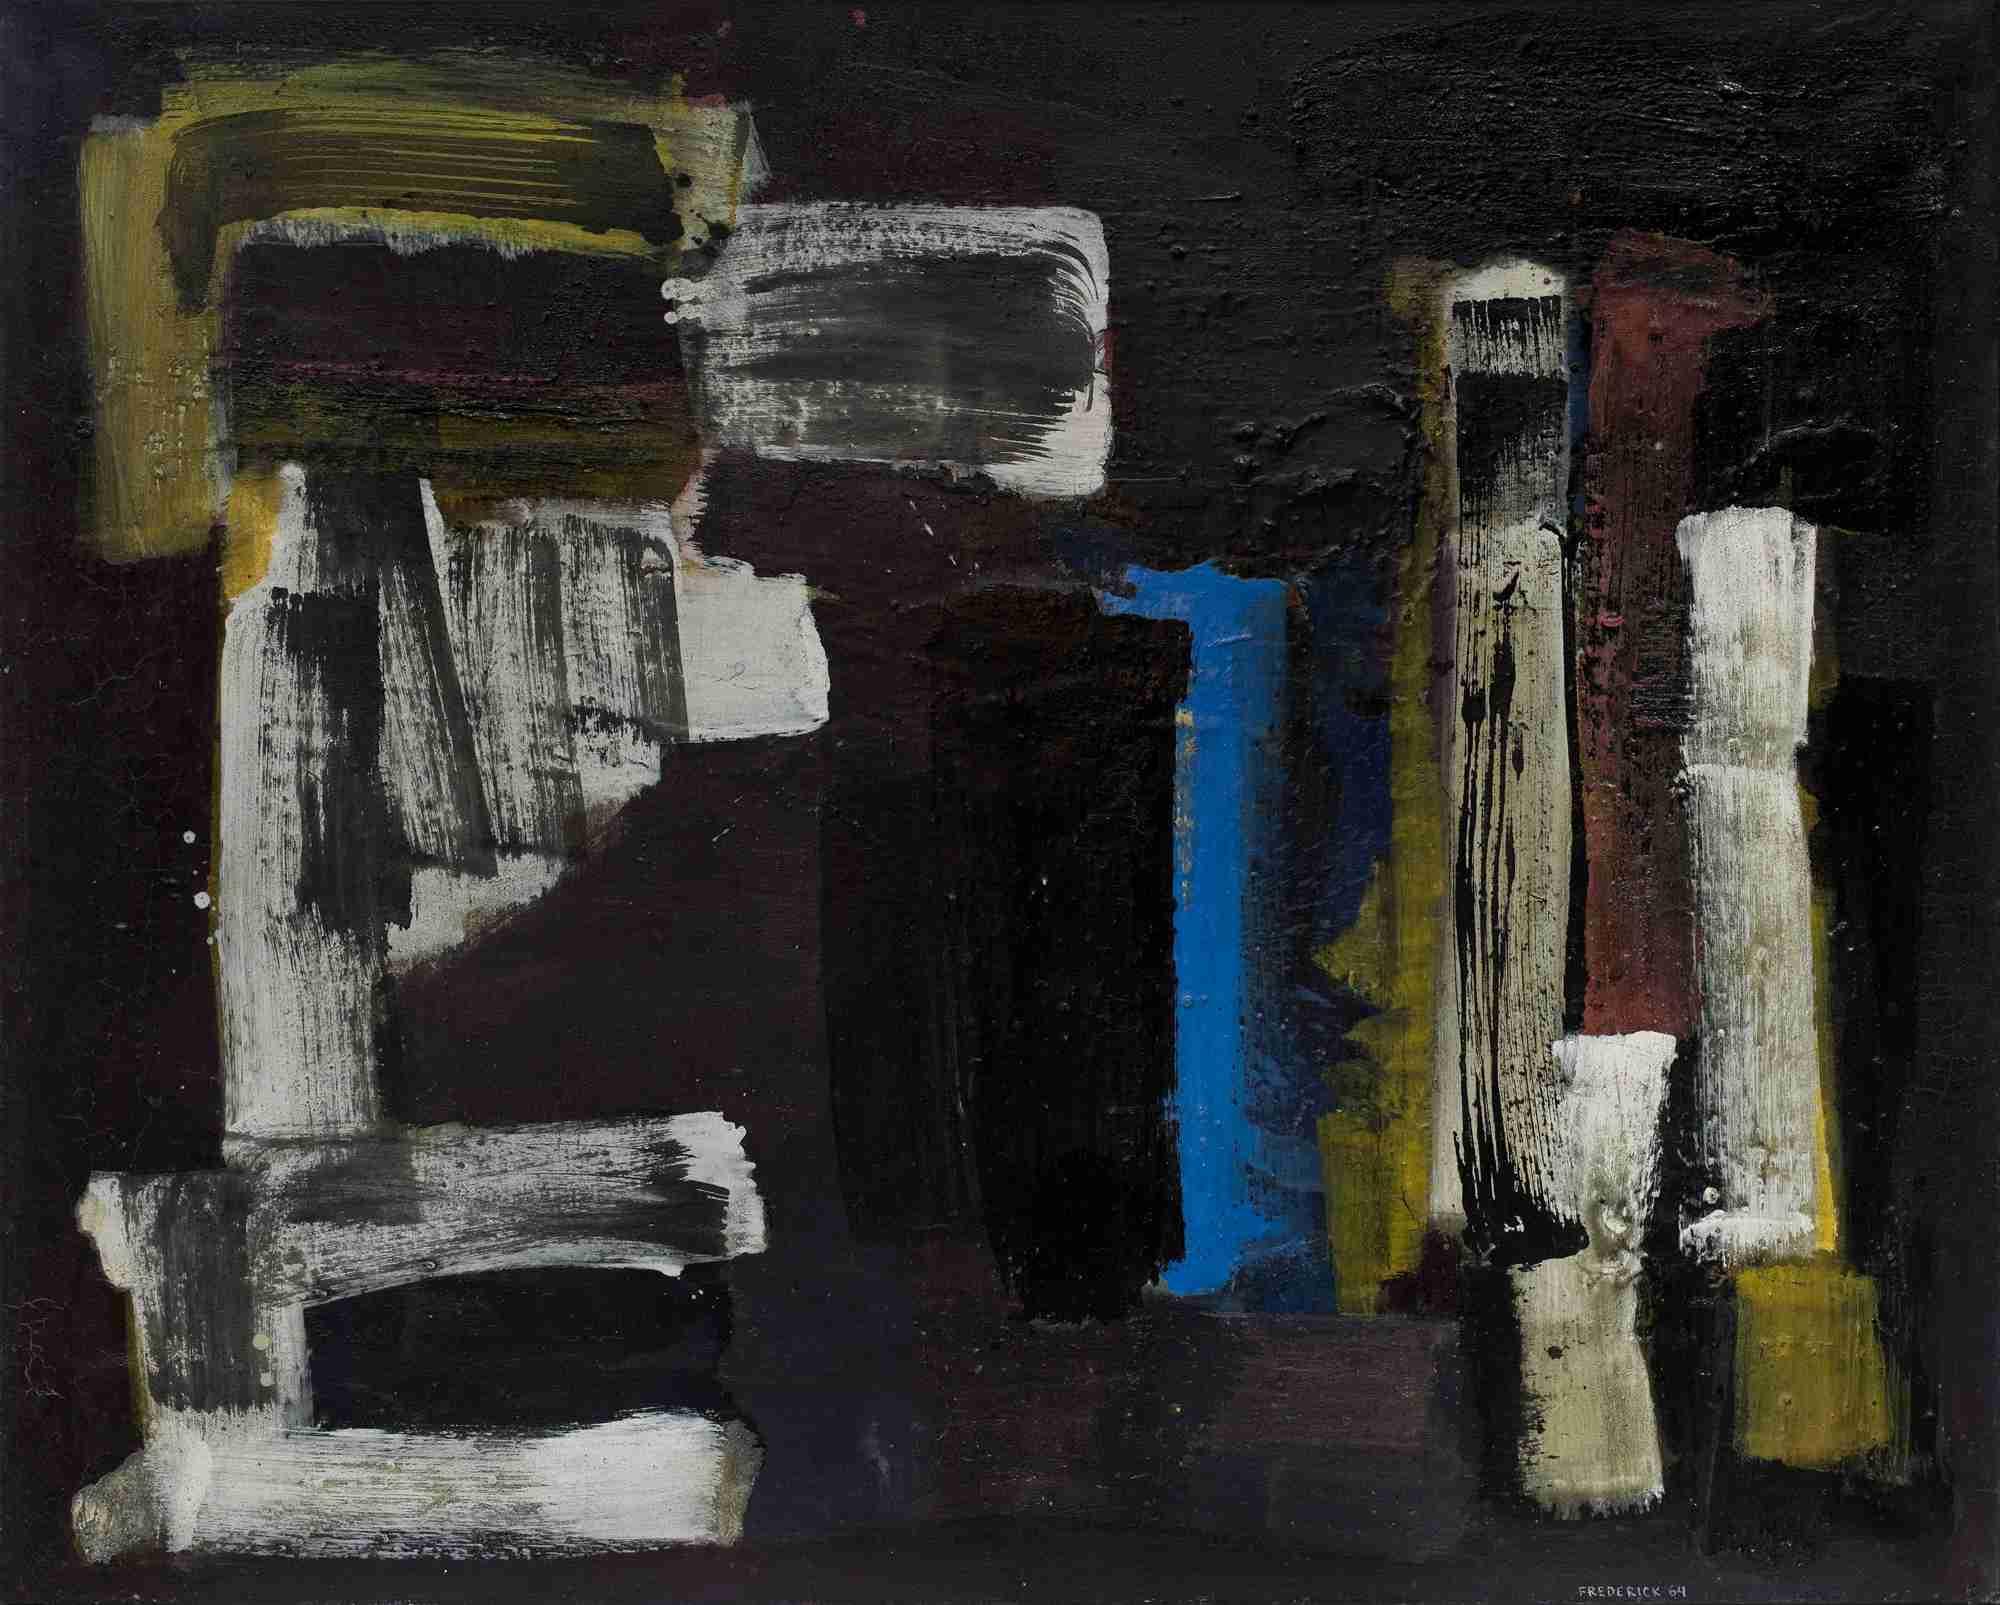 Untitled, 1964